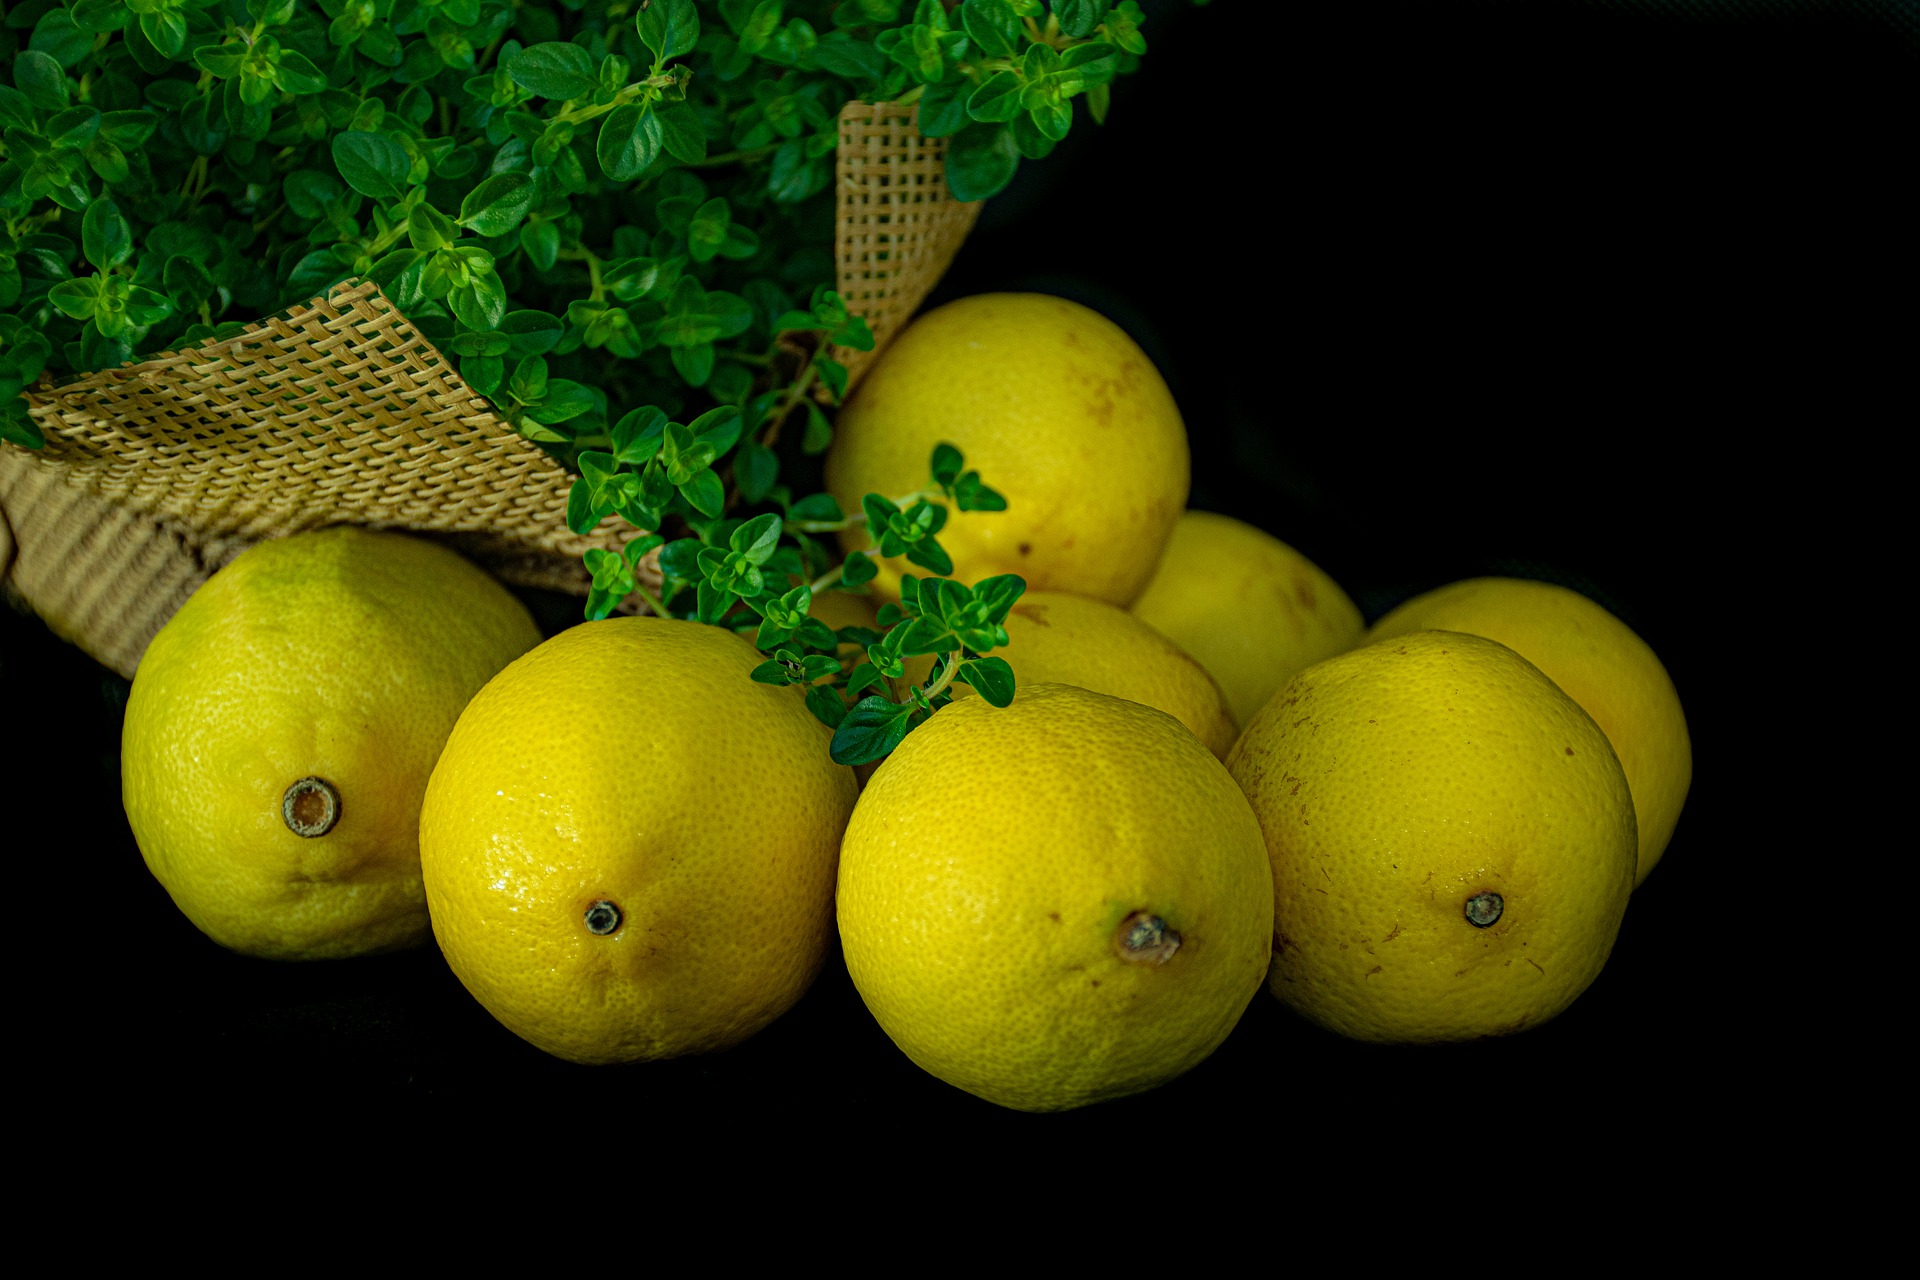 lemons-4529721_1920